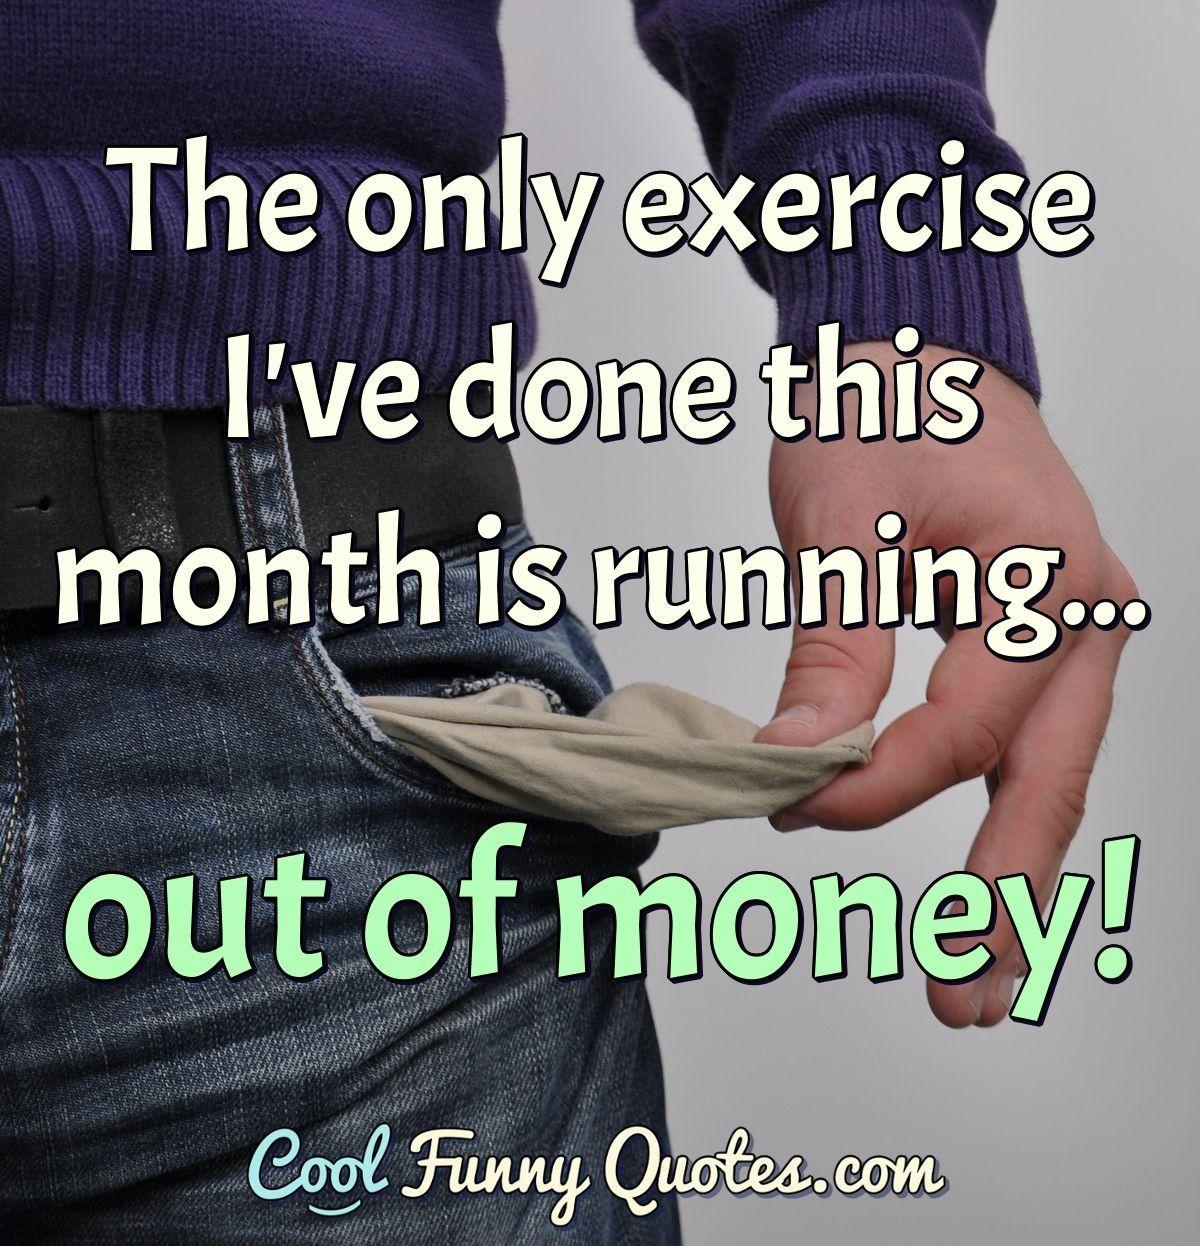 Funny Quote Money Quotes Funny Funny Quotes Money Quotes